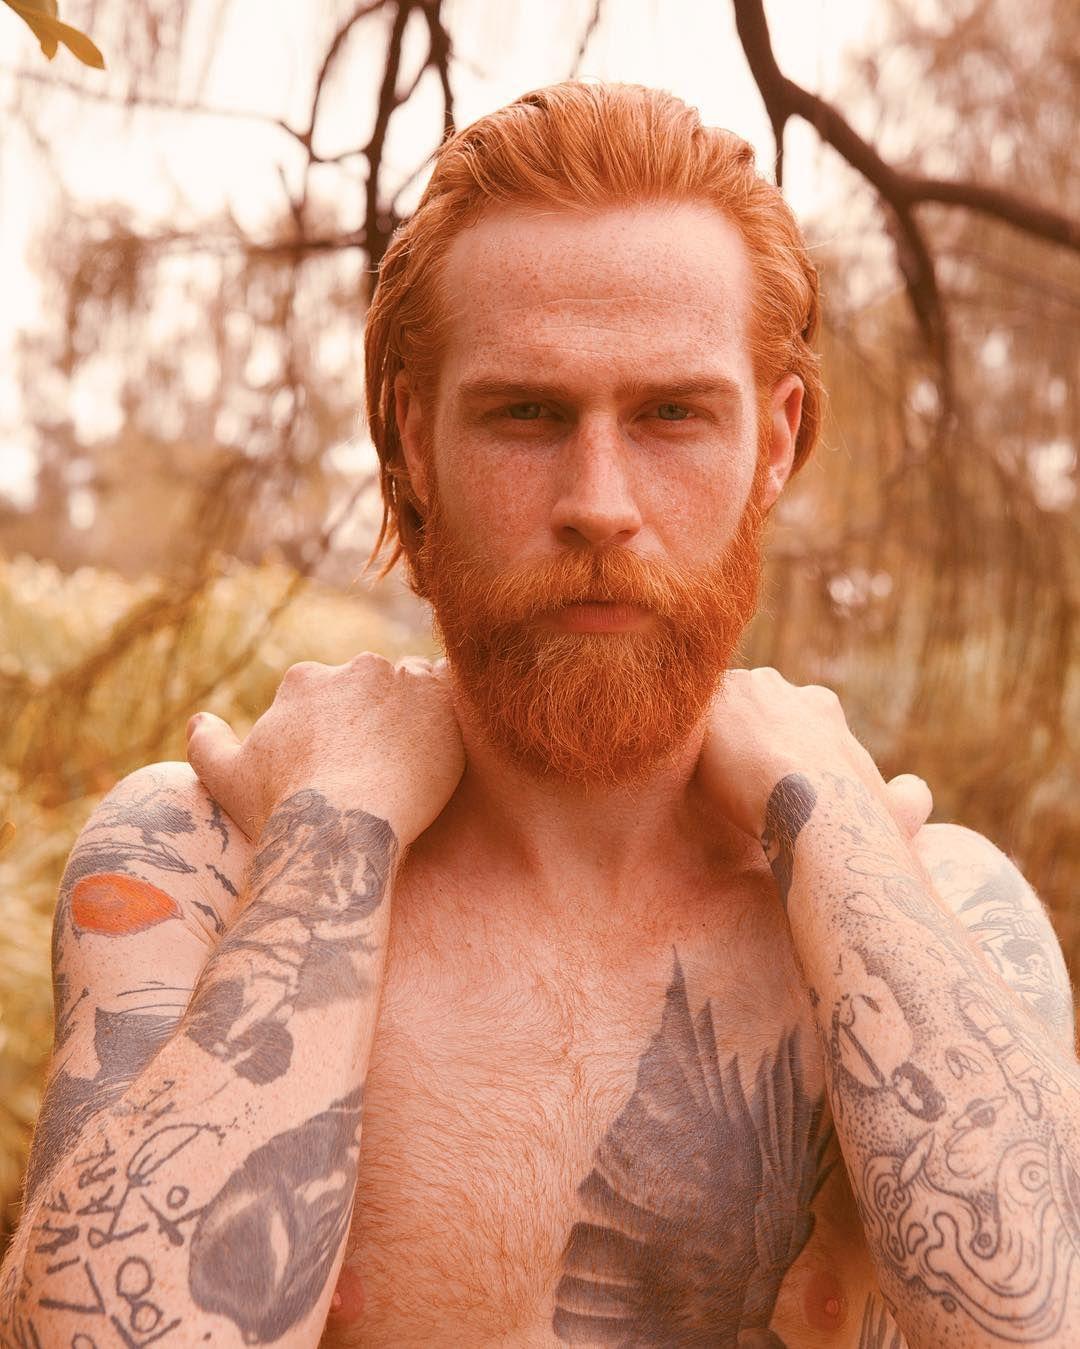 Gwilym pugh full red beard mustache beards bearded man men gwilym pugh full red beard mustache beards bearded man men tattoos tattooed redhead ginger handsome fandeluxe Document